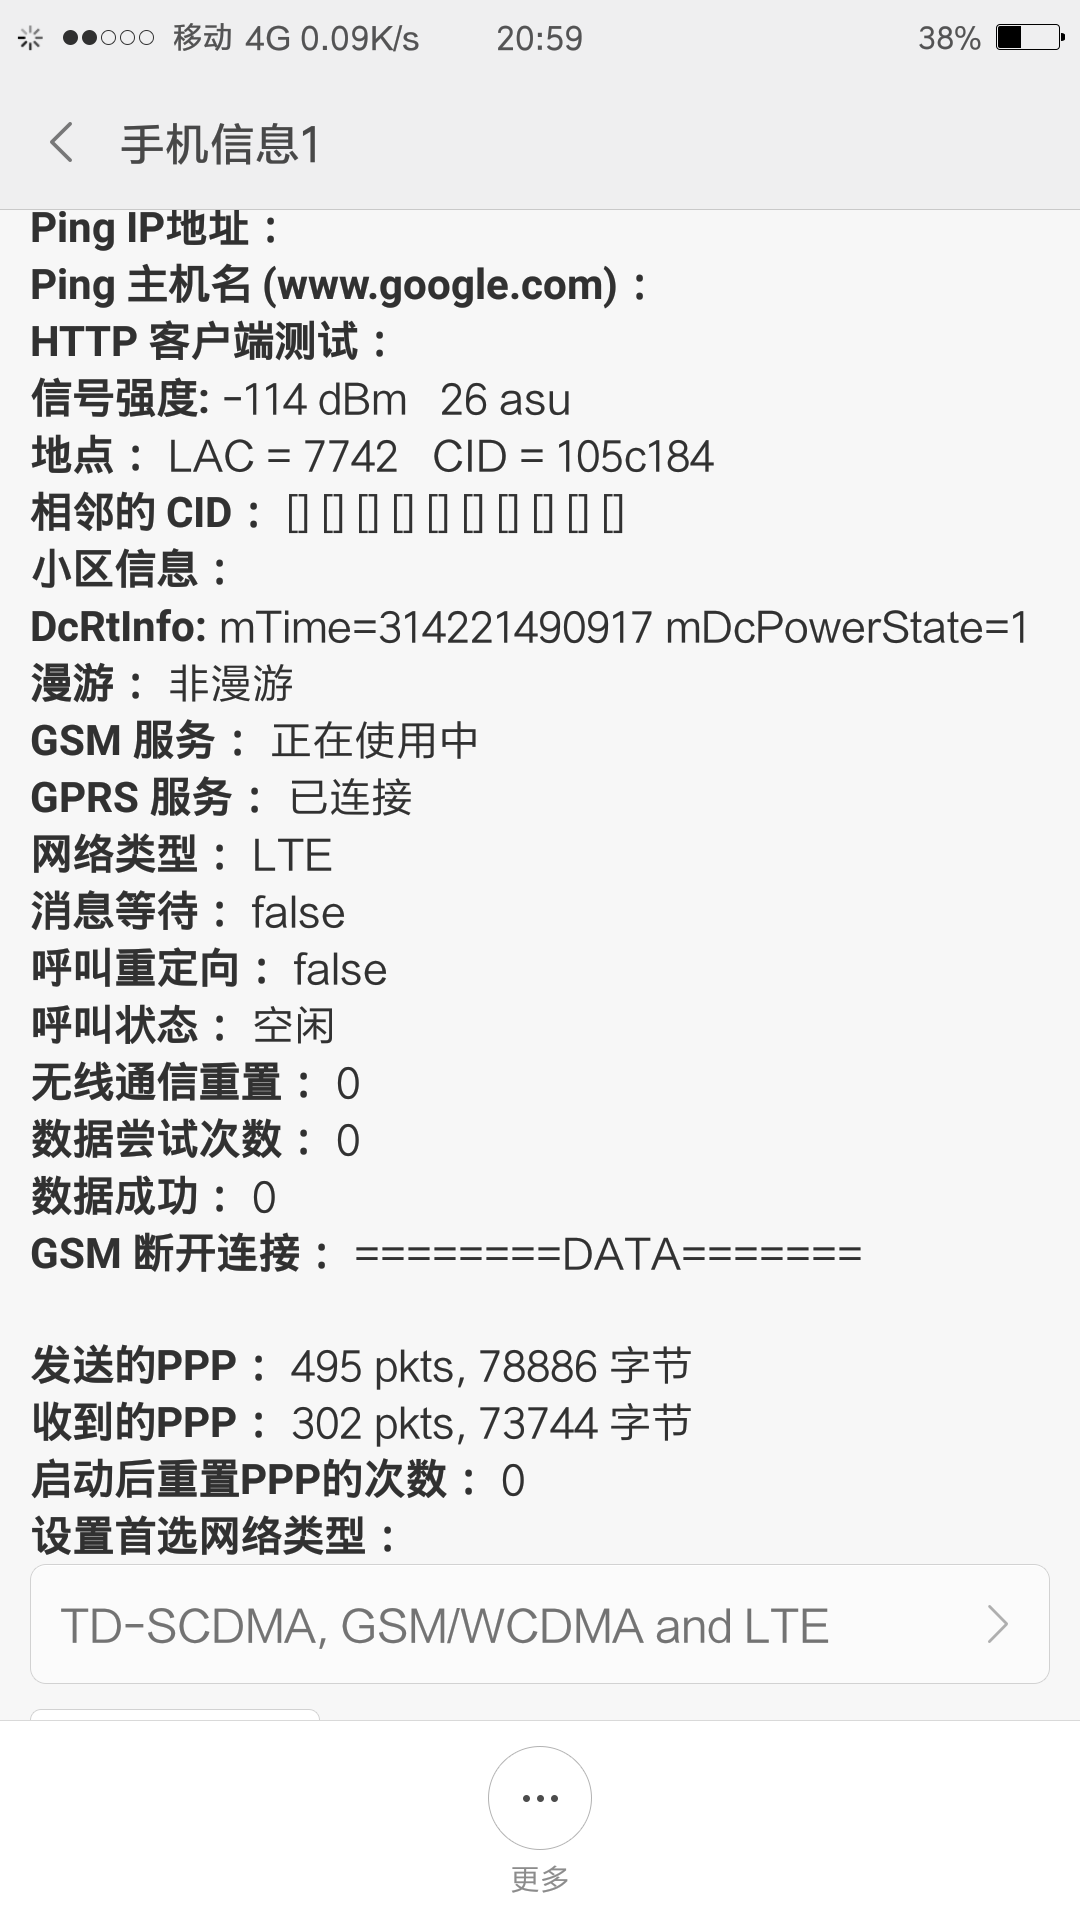 Screenshot_2017-03-05-20-59-08-867_com.android.se.png